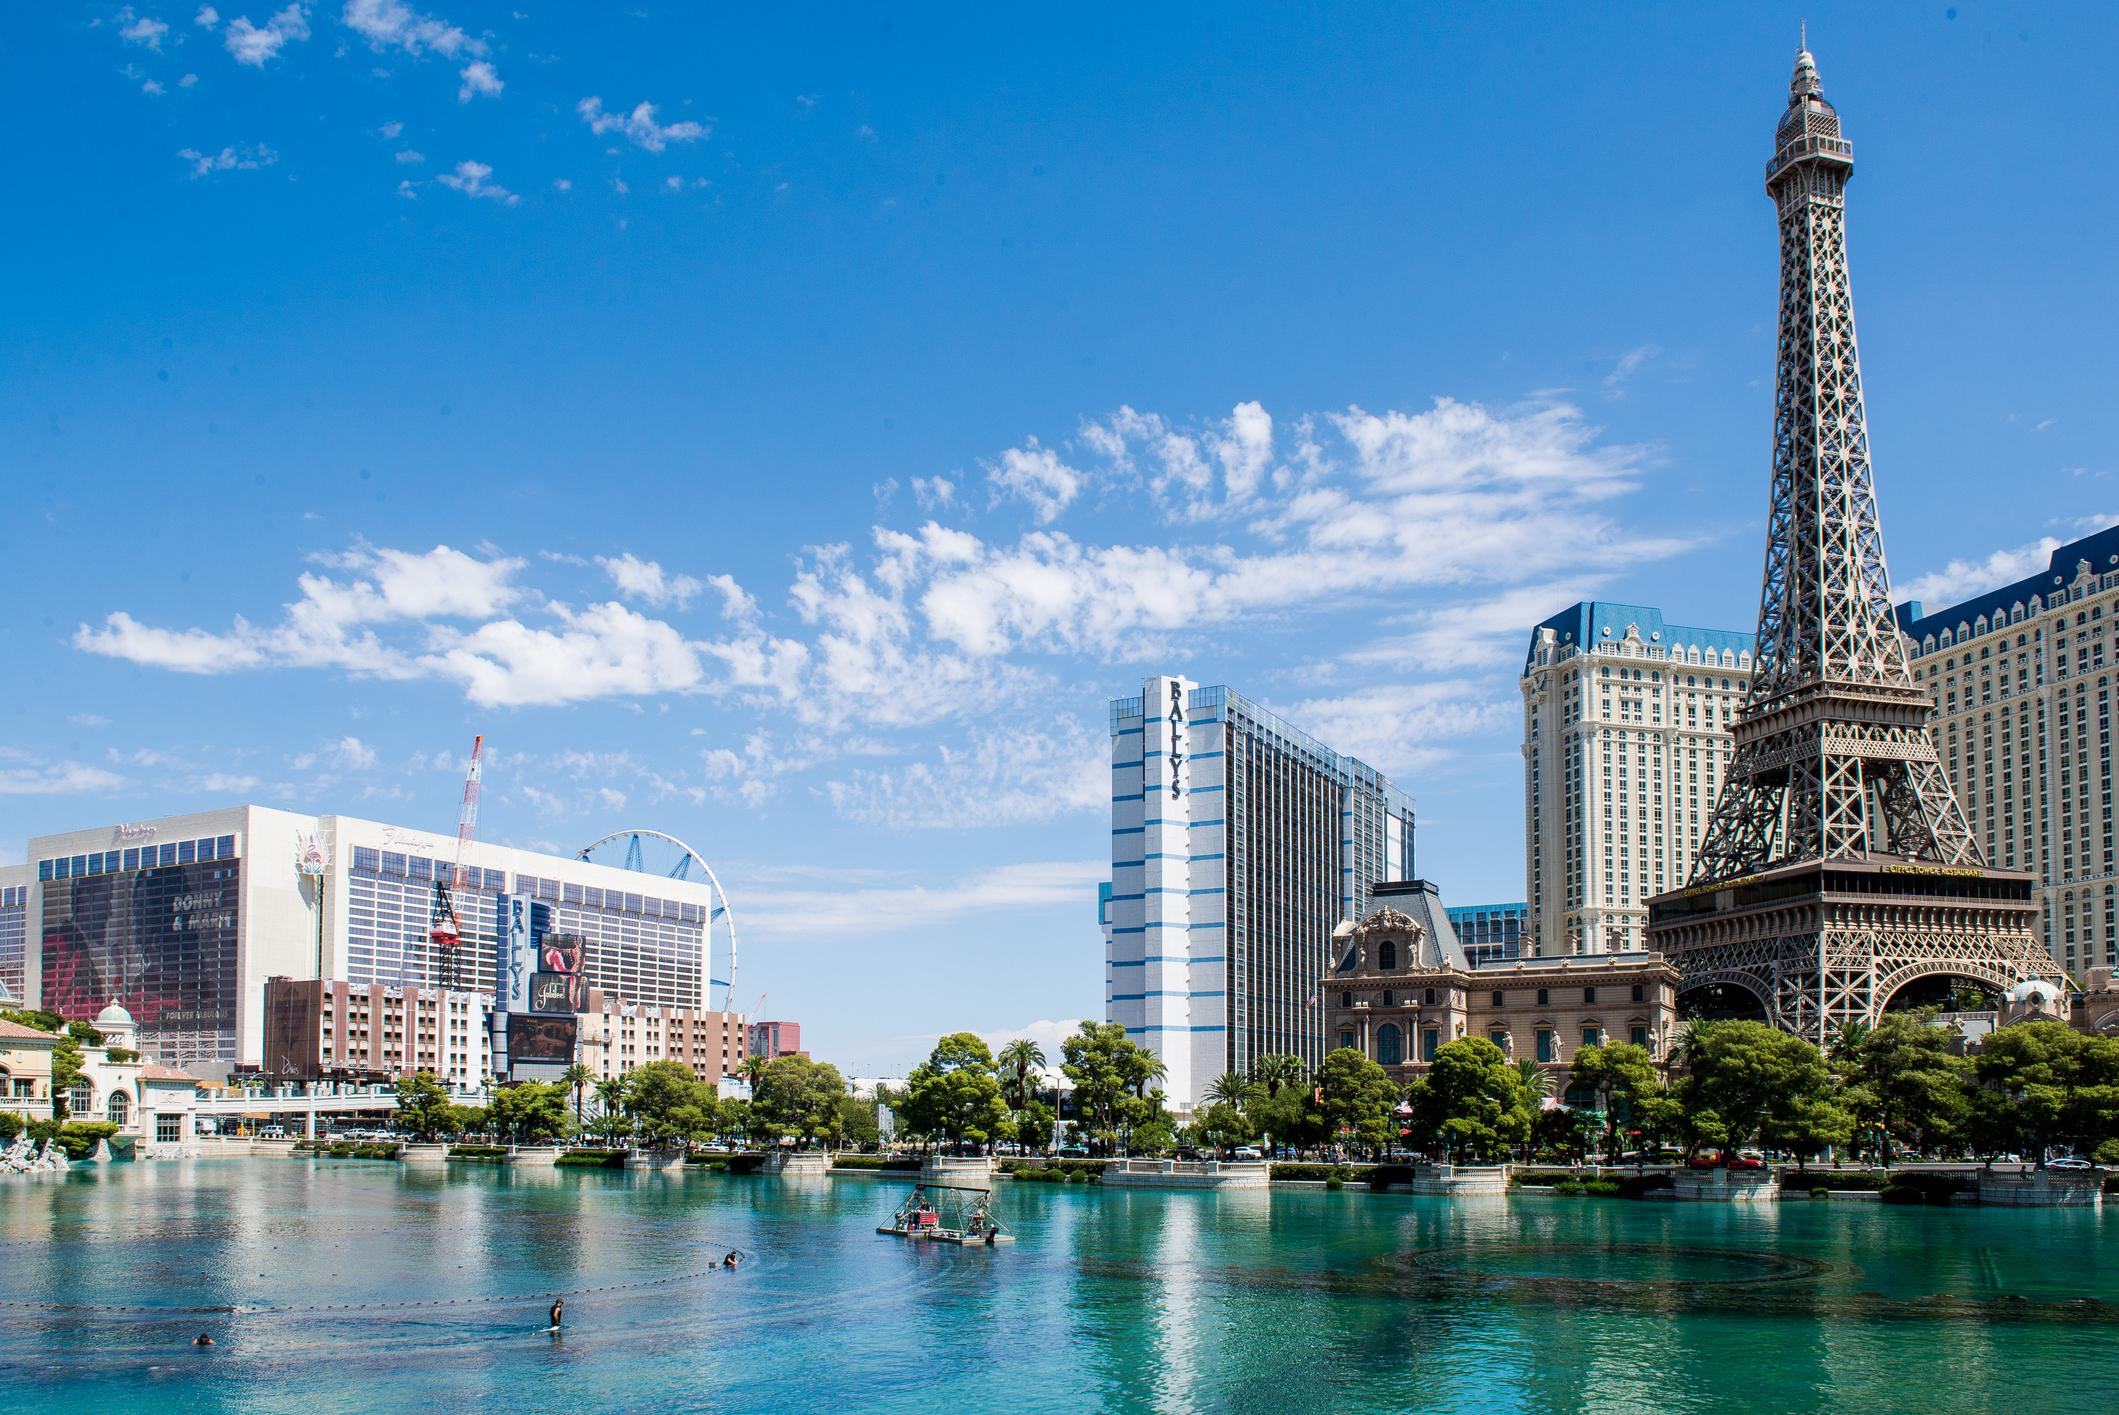 A view of the Las Vegas skyline.